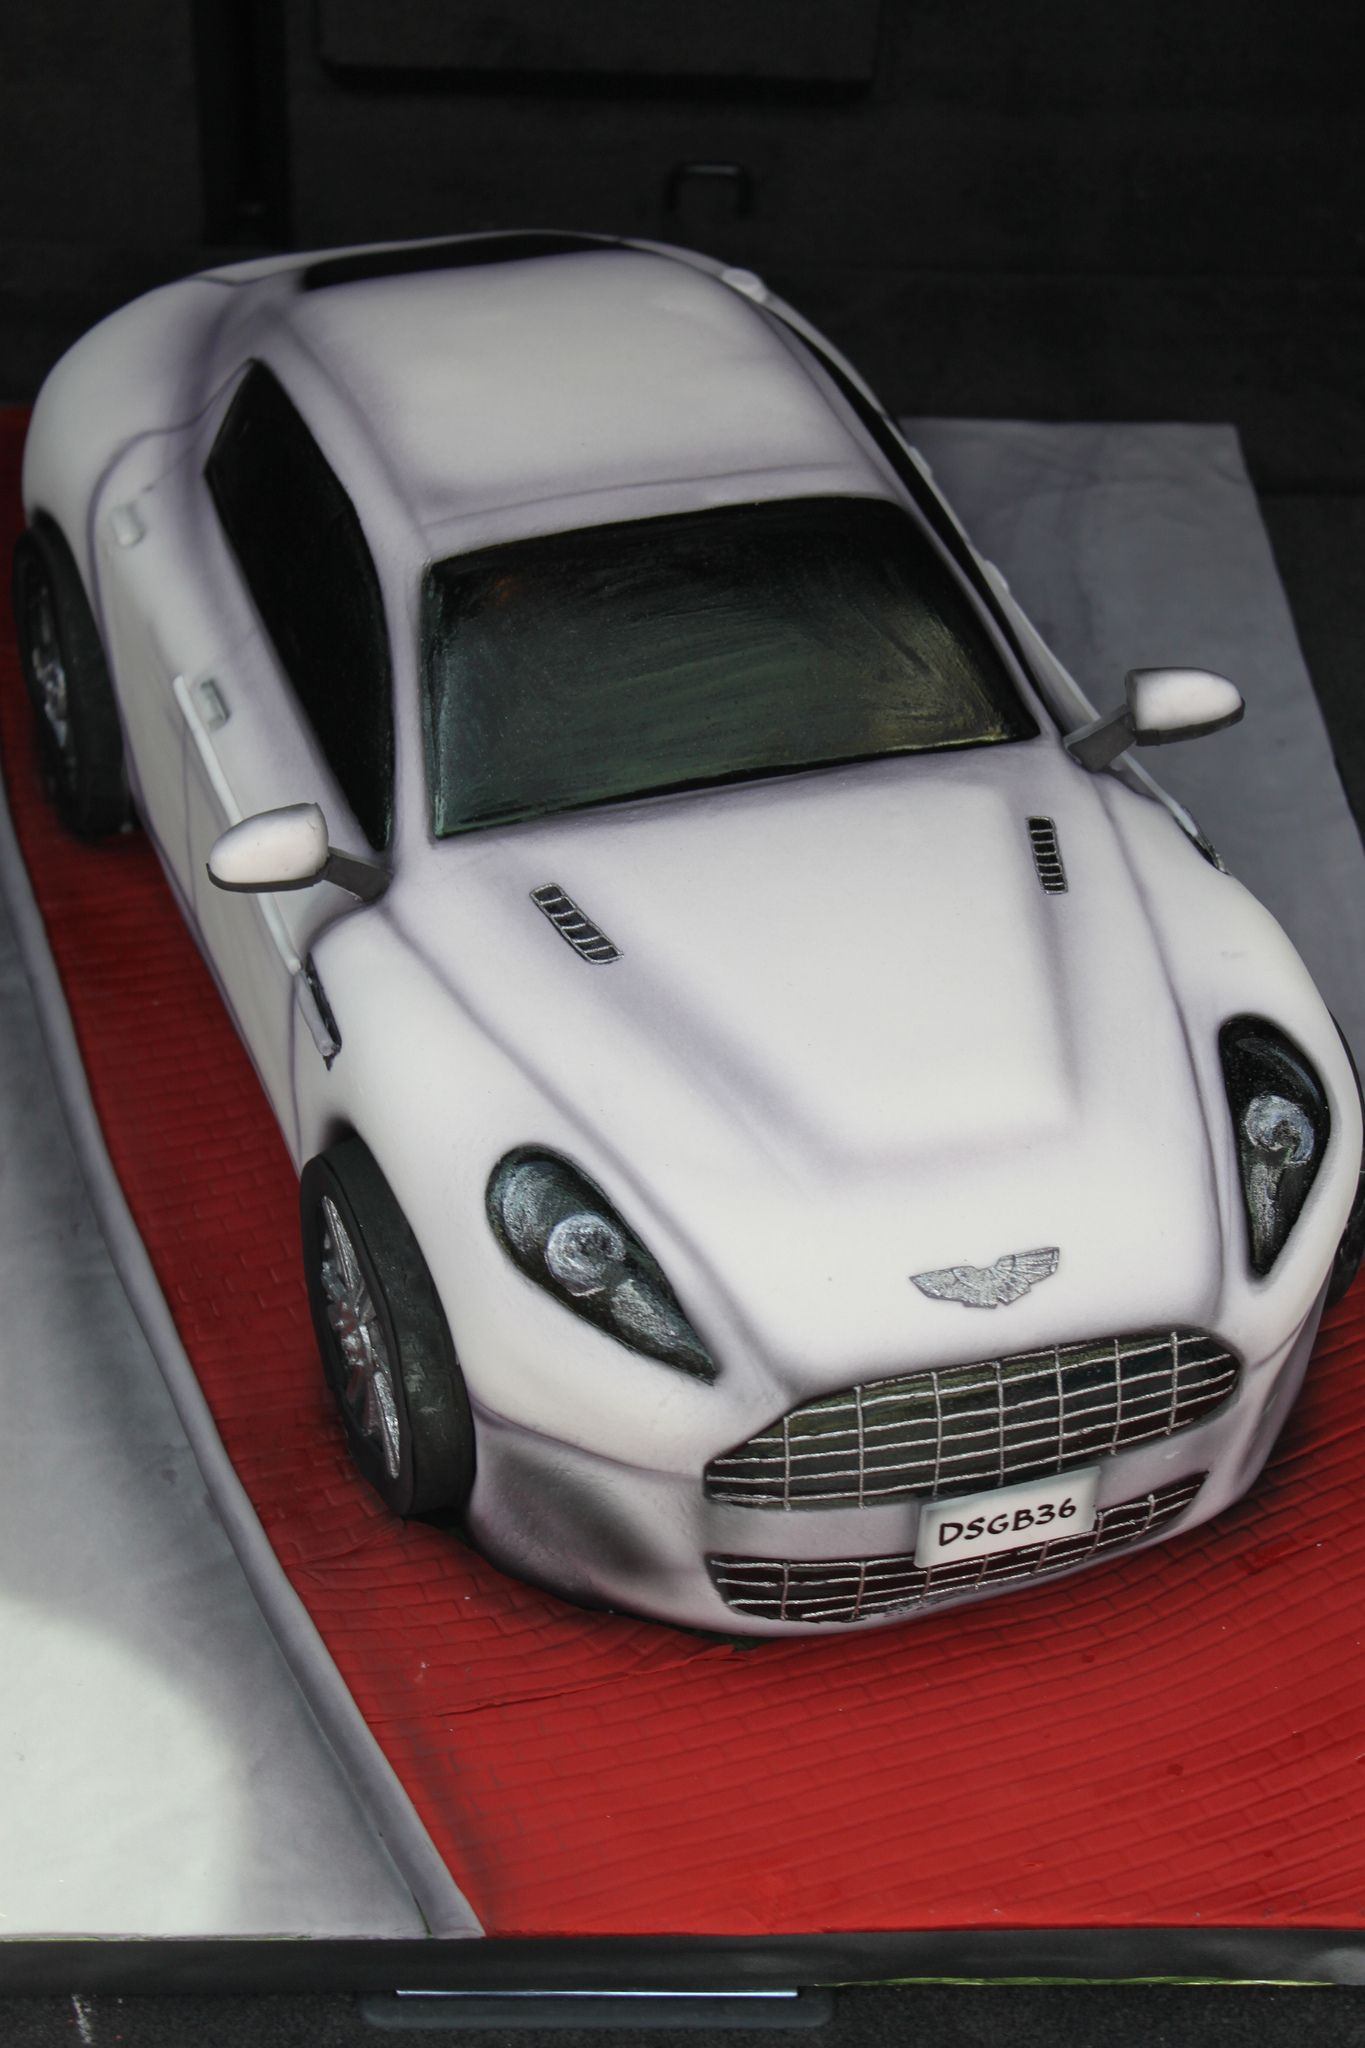 Aston Martin Vehicle Cakes Pinterest Aston Martin Cake And